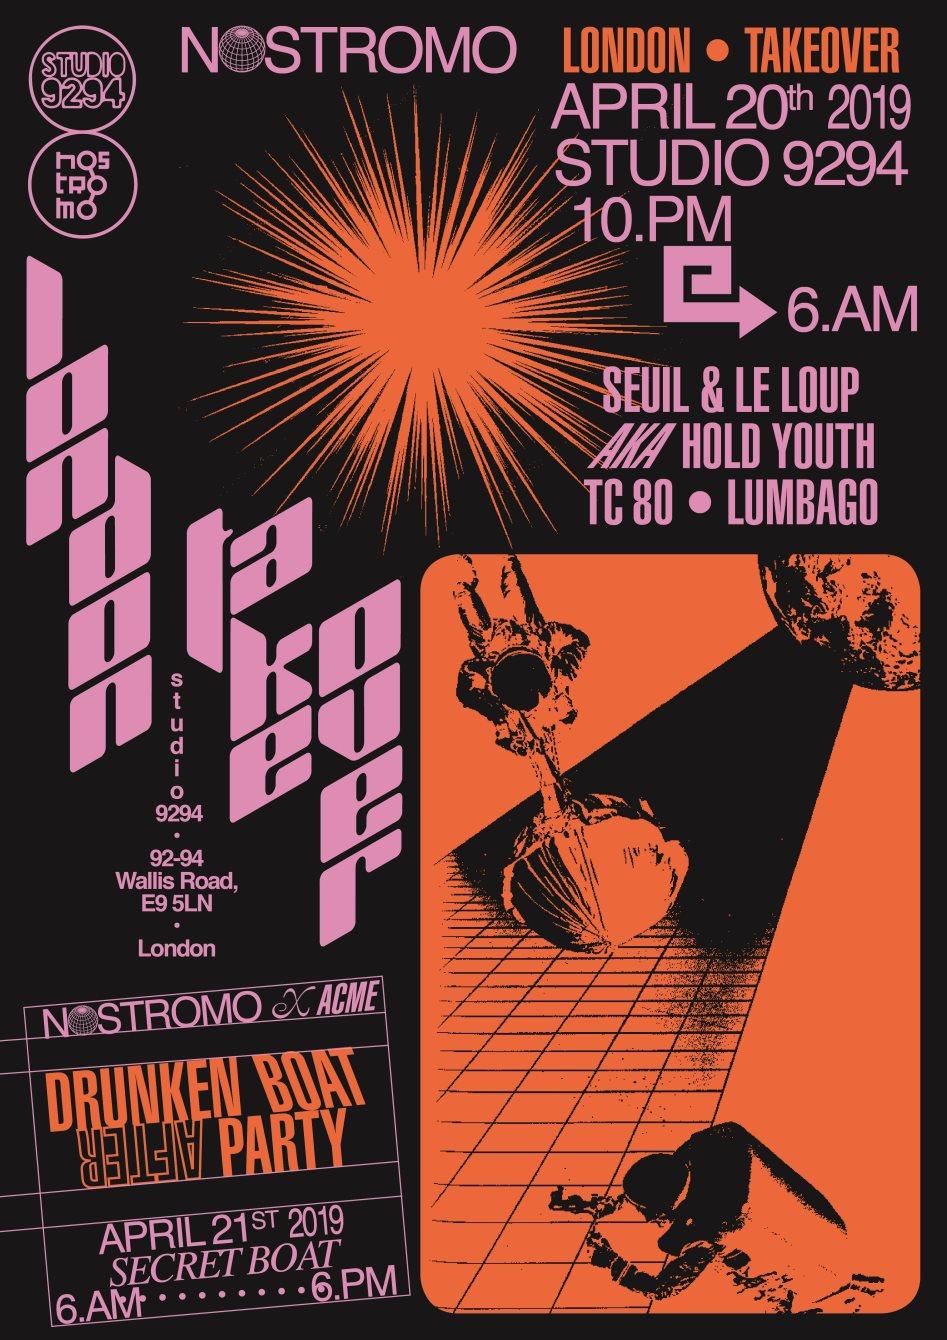 Le Loup, Seuil, TC80 & Lumbago: Nostromo London Takeover - Flyer back